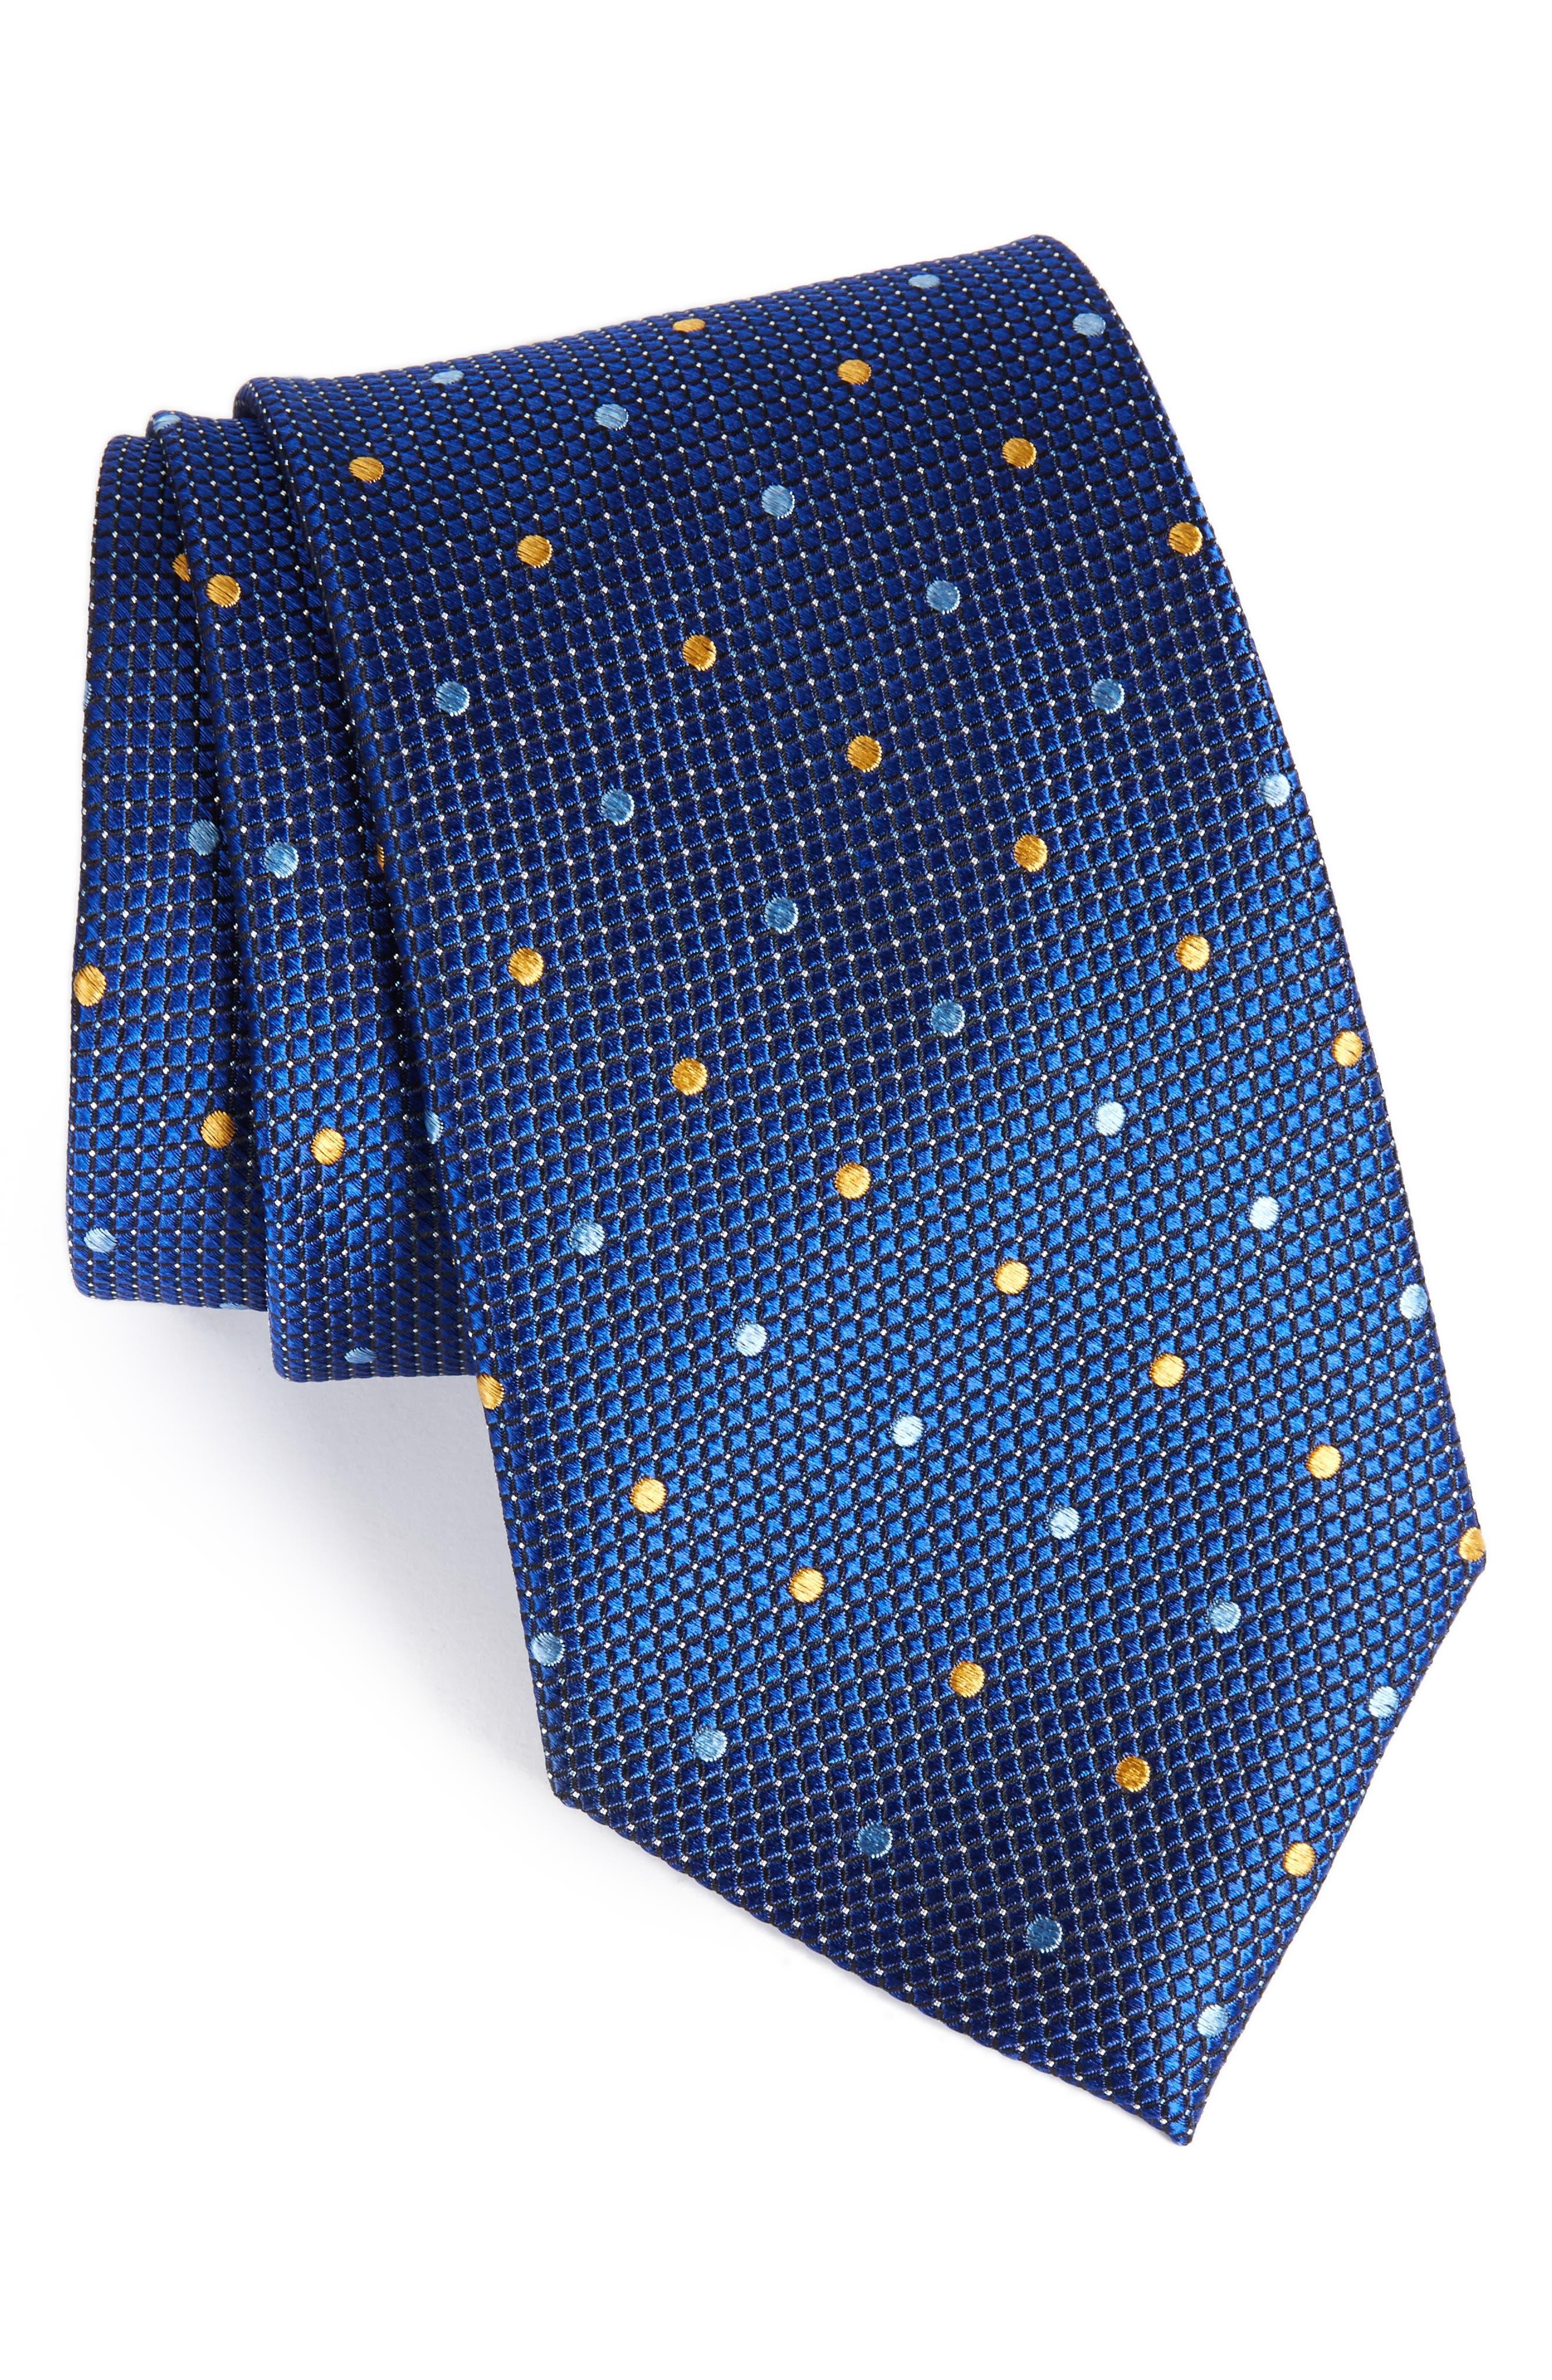 Main Image - Nordstrom Men's Shop Graphic Dots Silk Tie (X-Long)